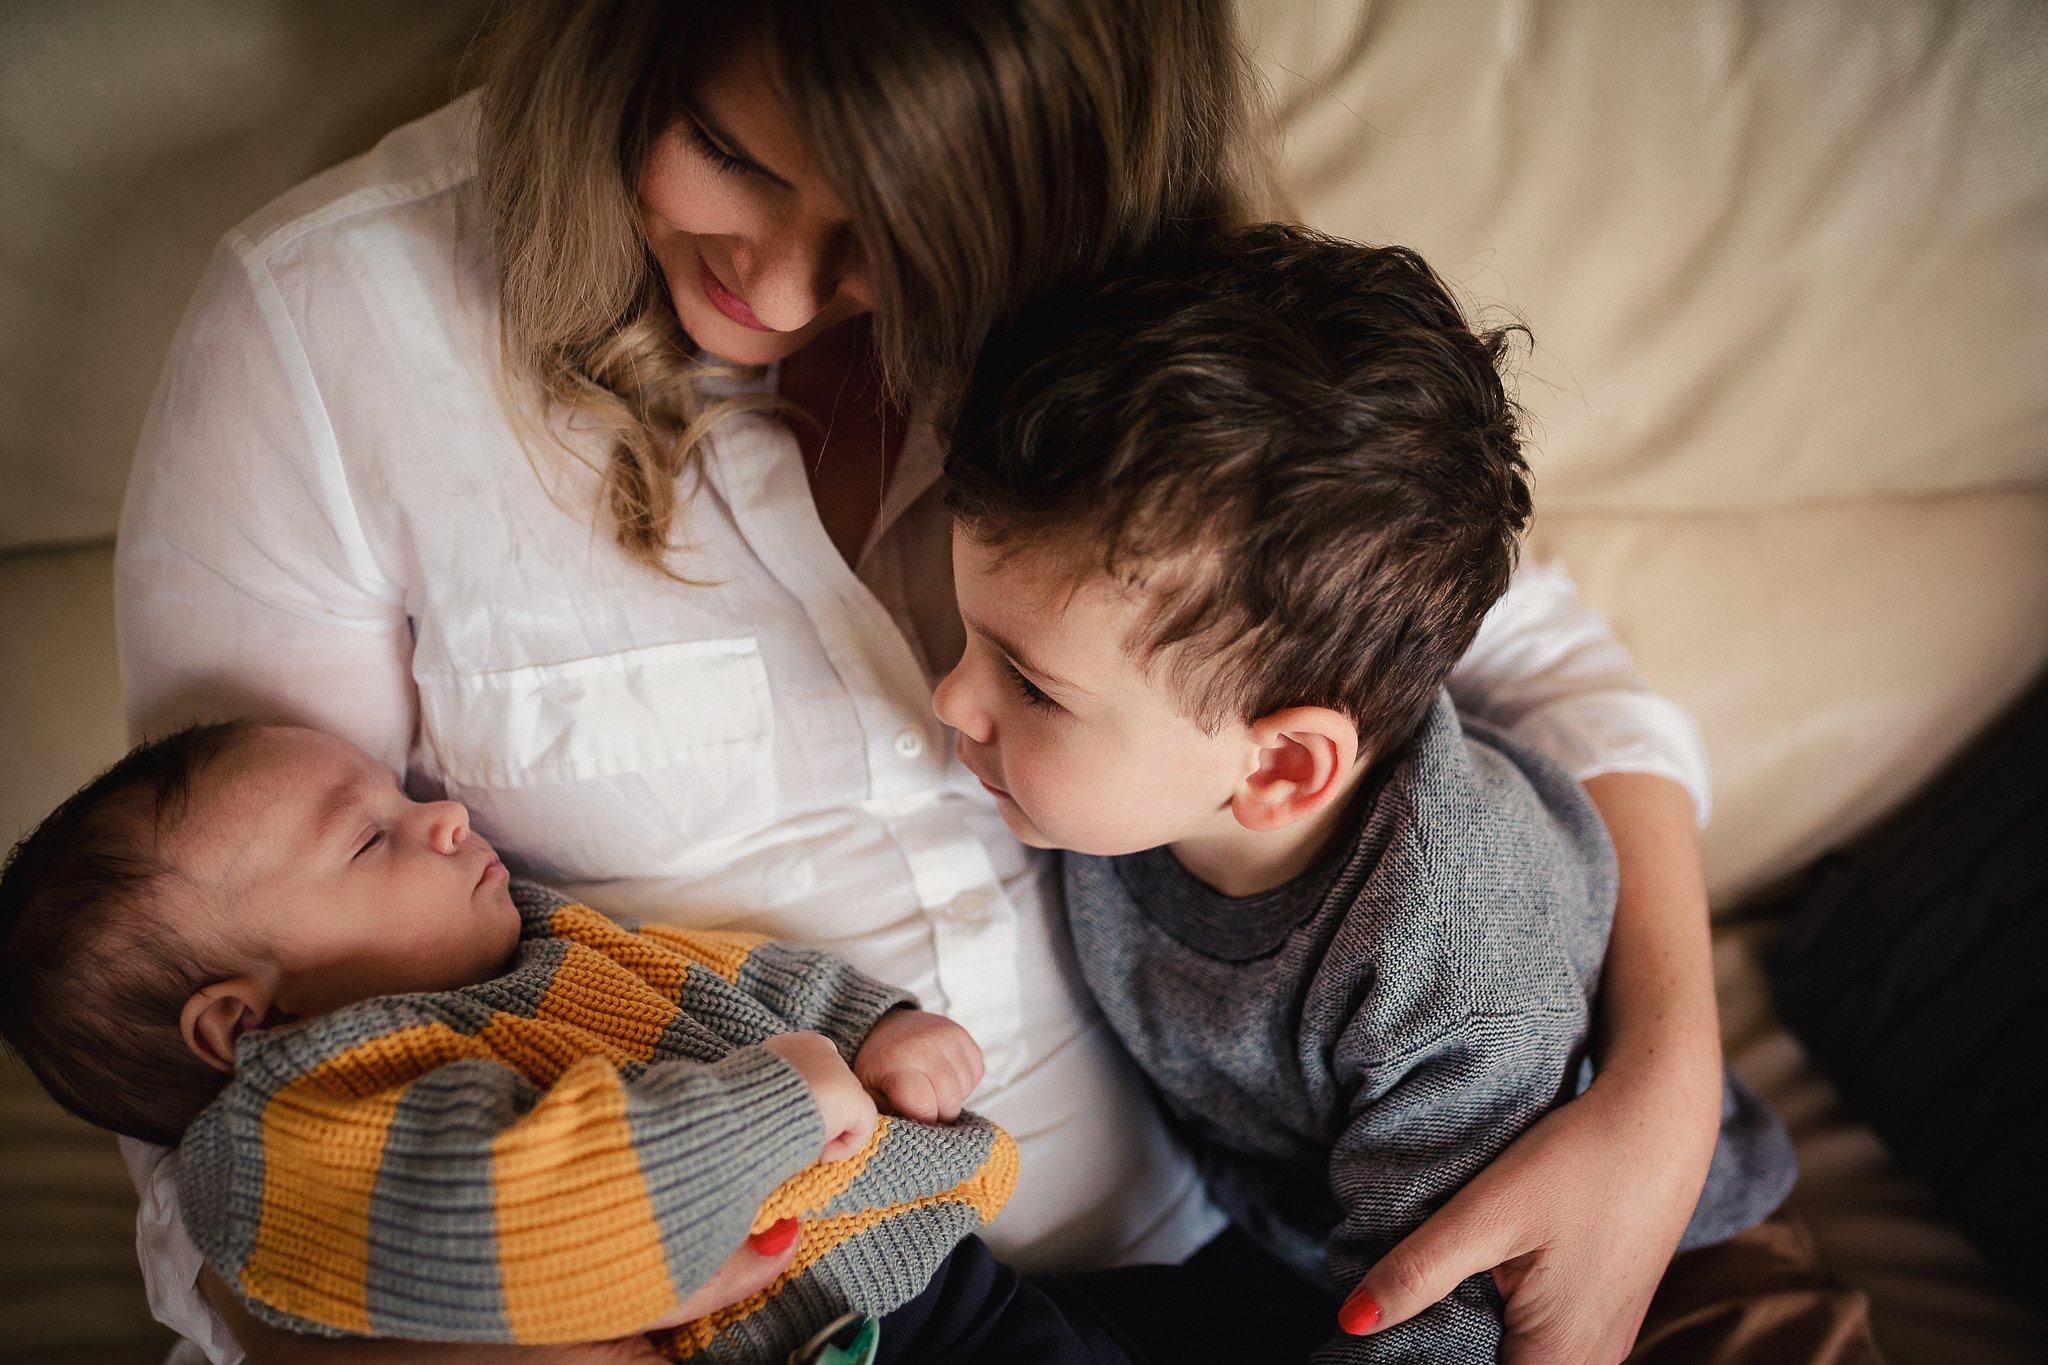 newborn-baby-in-home-family-photography-albury-wodonga-north-east-victoria (3).jpg